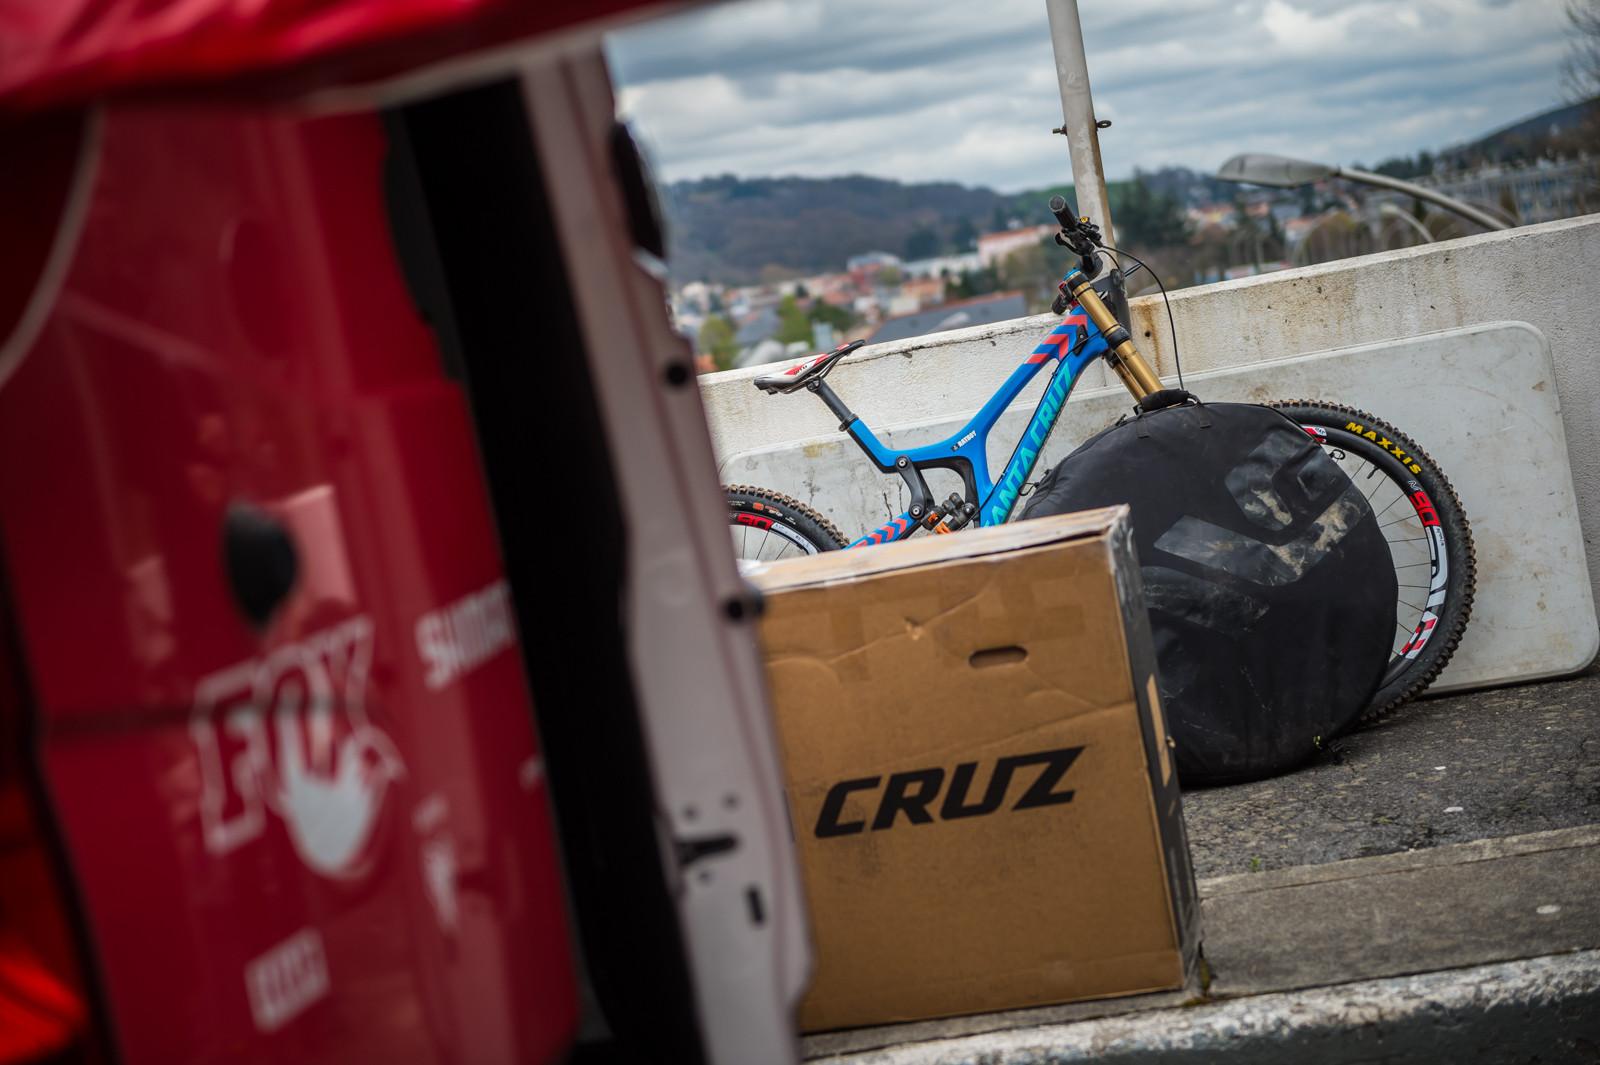 PIT BITS - Santa Cruz Syndicate at Lourdes World Cup - PIT BITS - 2016 Lourdes World Cup Downhill - Mountain Biking Pictures - Vital MTB